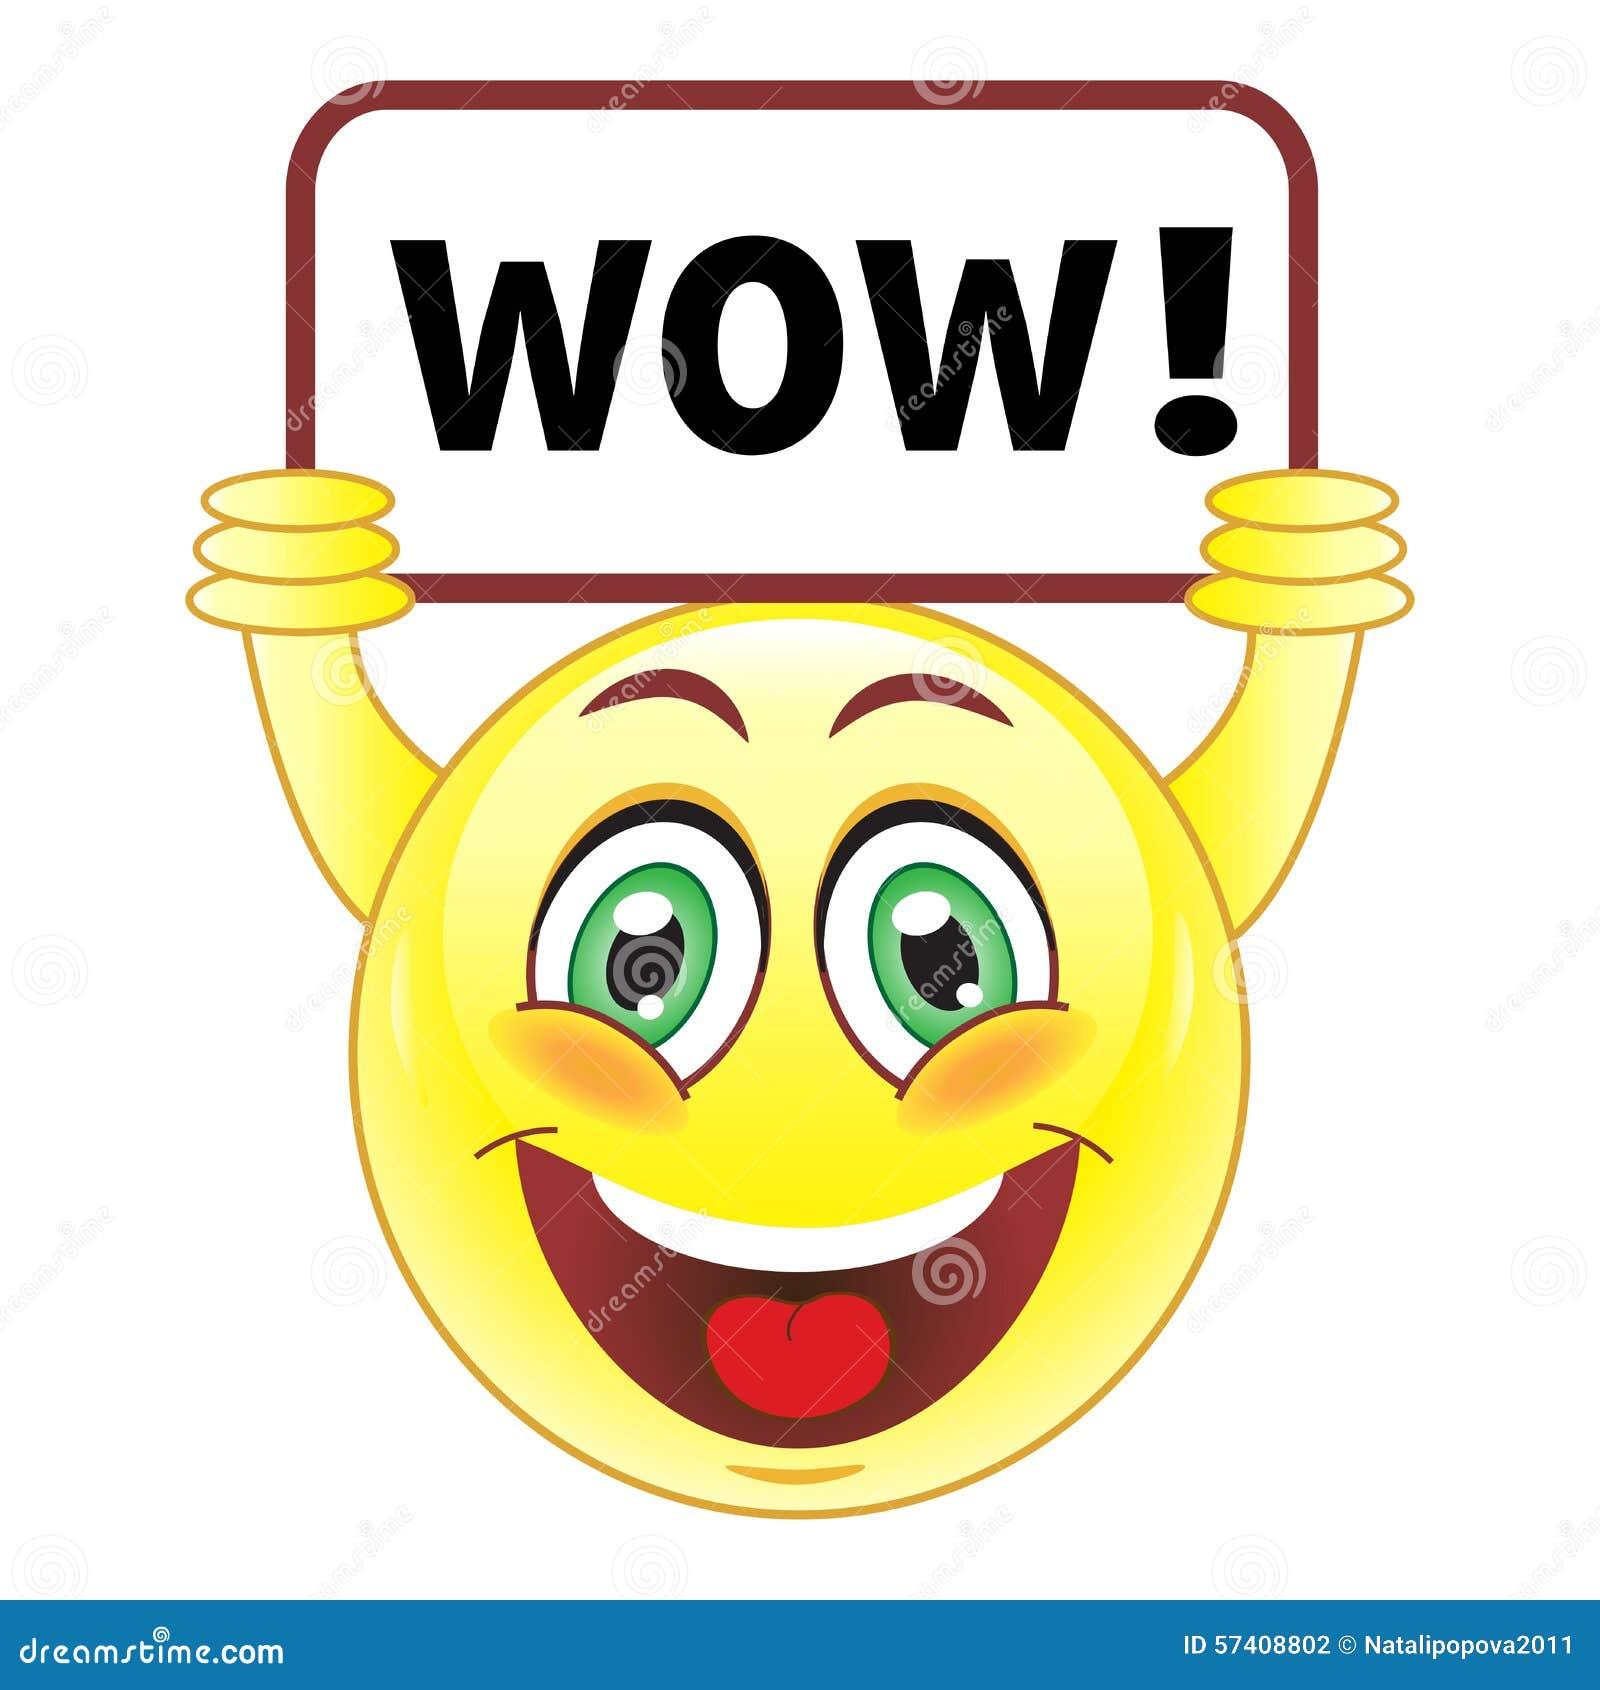 smiley mit wow zeichen vektor abbildung bild 57408802 happy face images clip art free happy face images clip art